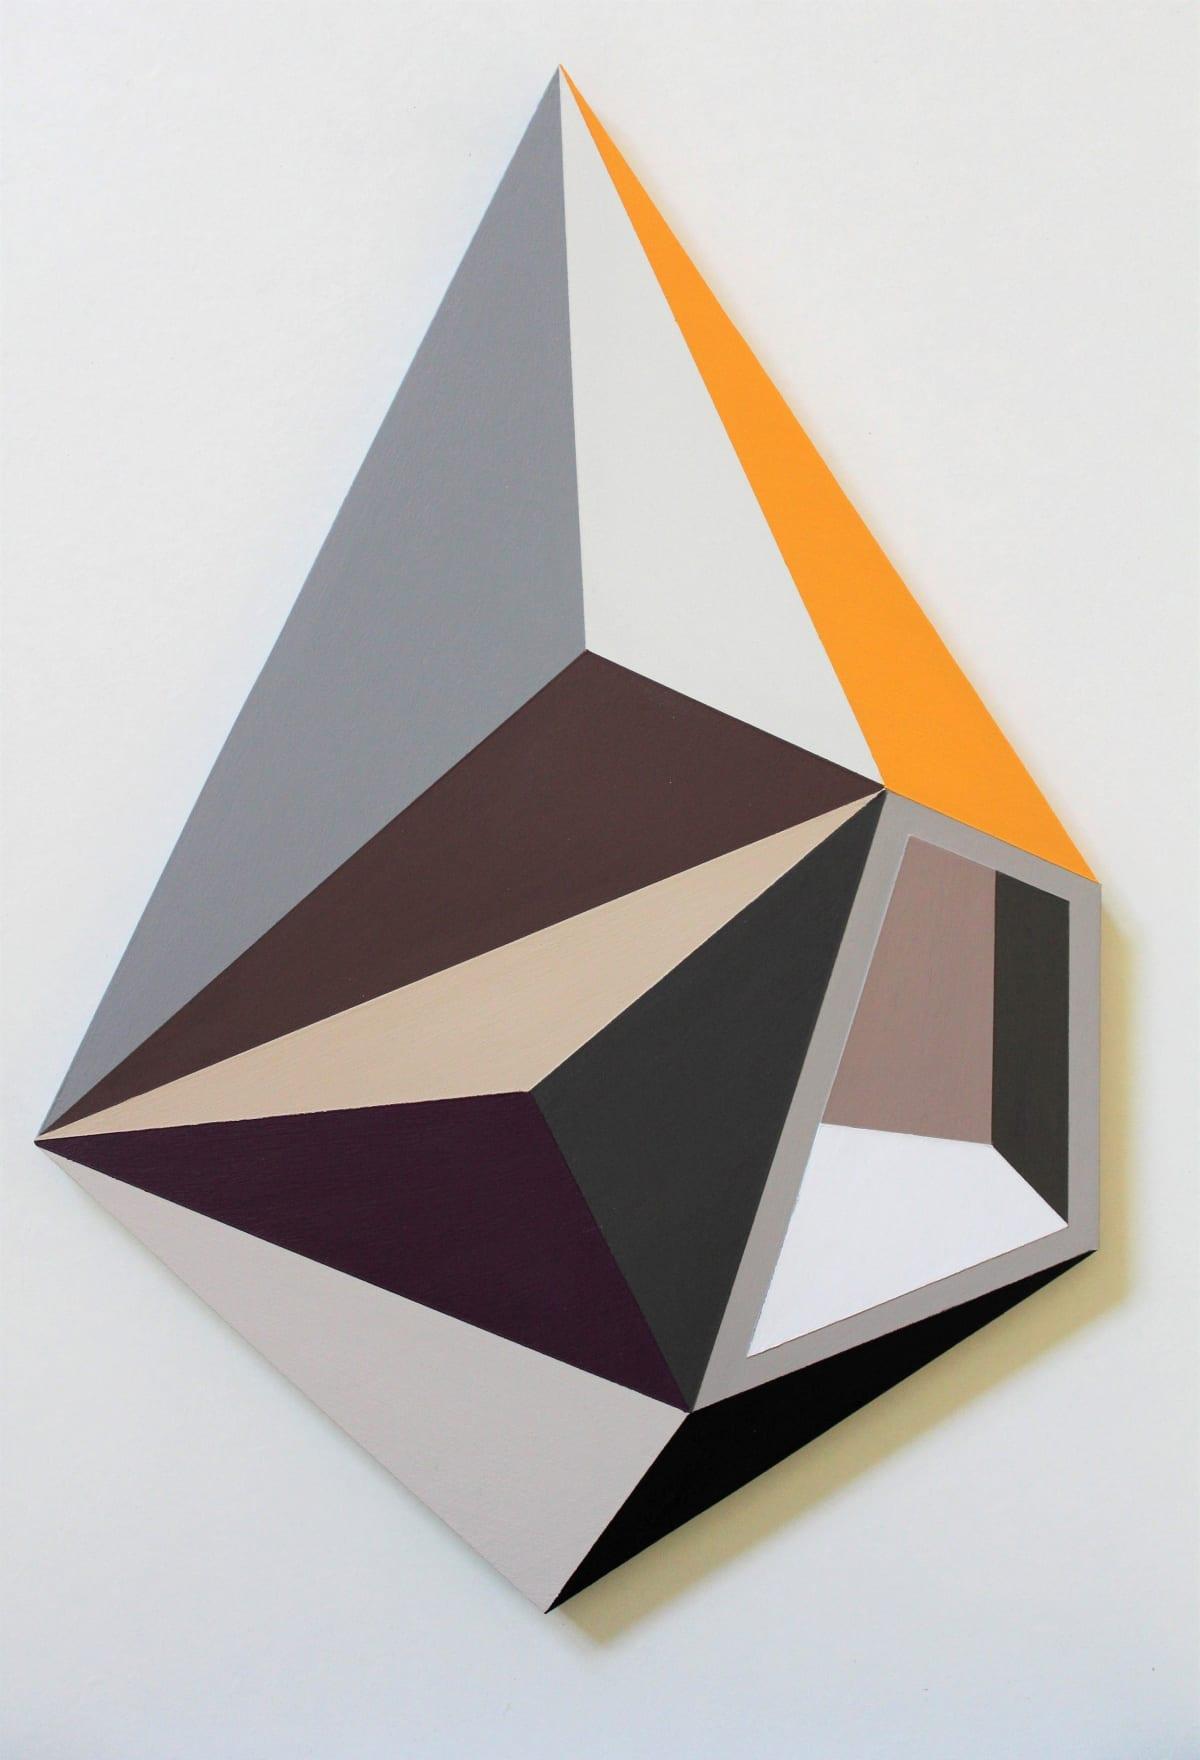 Megan Burns, Altered space 0.15, emulsion on board, 44 x 30.5 cm